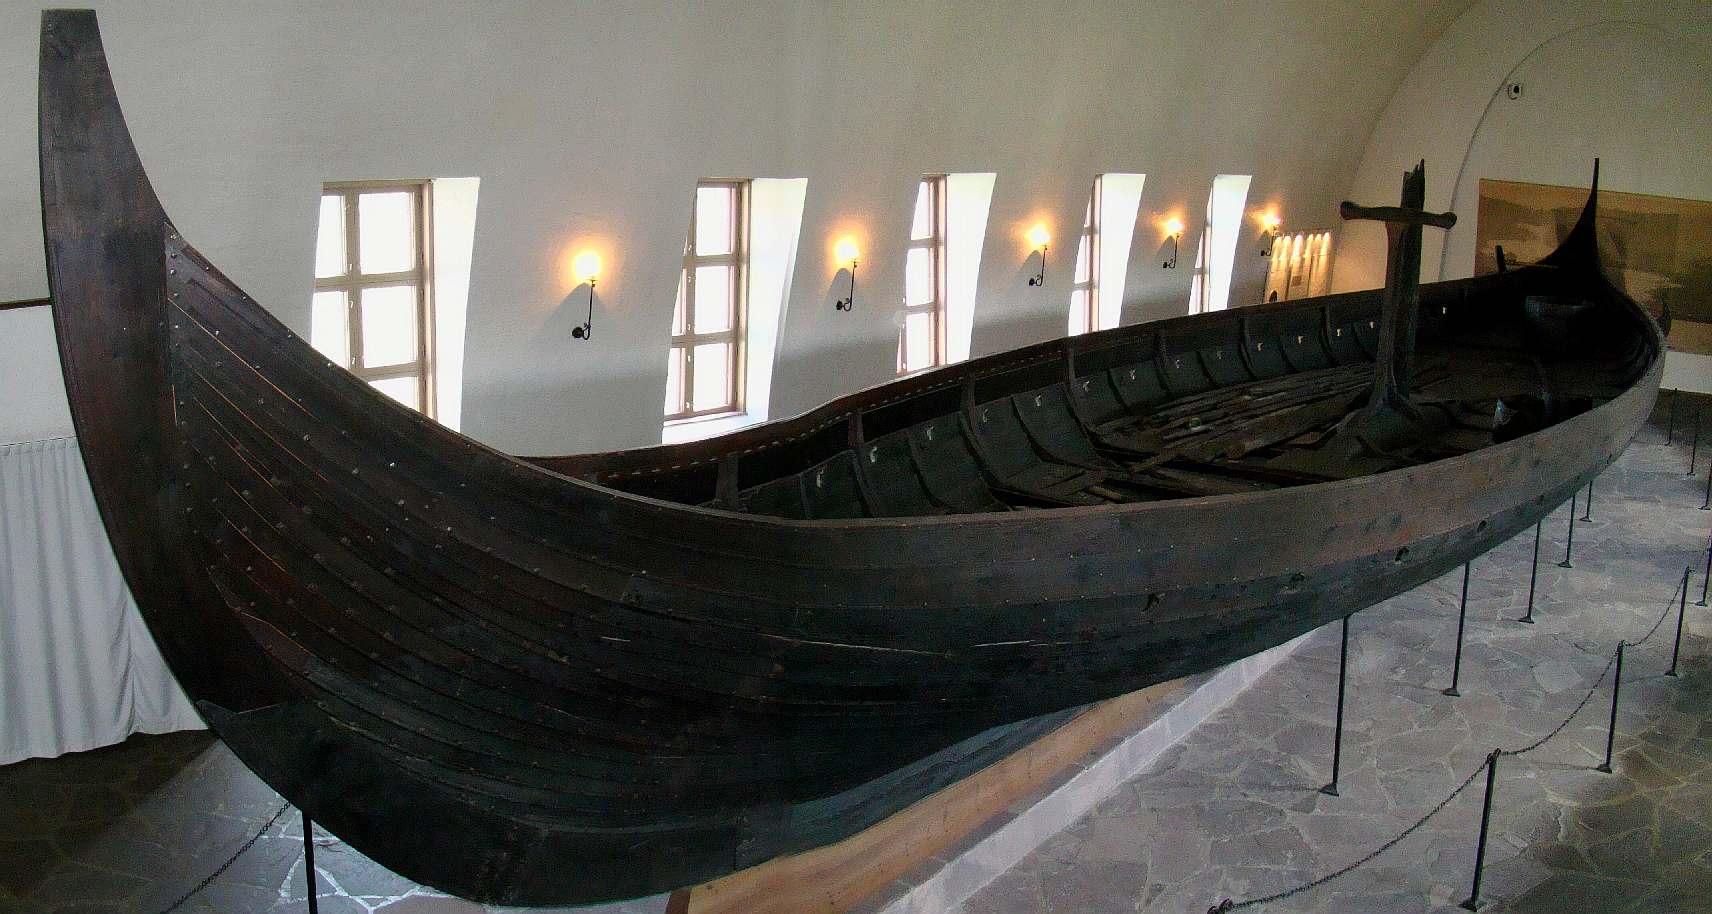 vikings longboats norsemen models making dragon boats